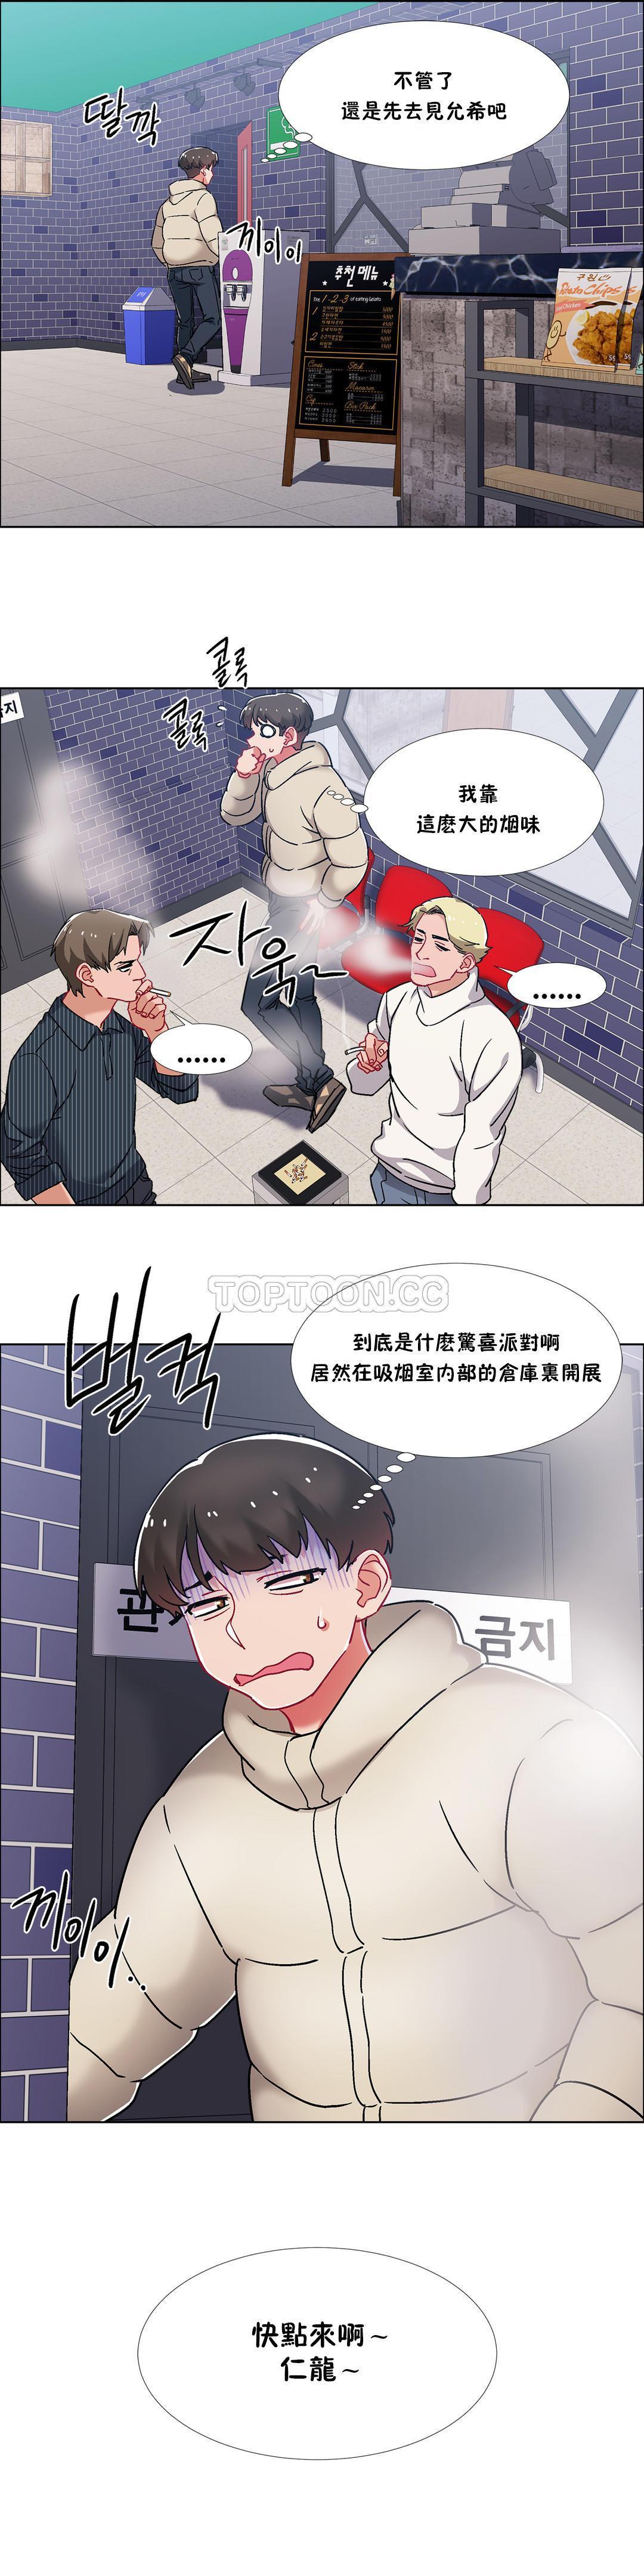 [Studio Wannabe] Rental Girls | 出租女郎 Ch. 33-58 [Chinese]  第二季 完结 157